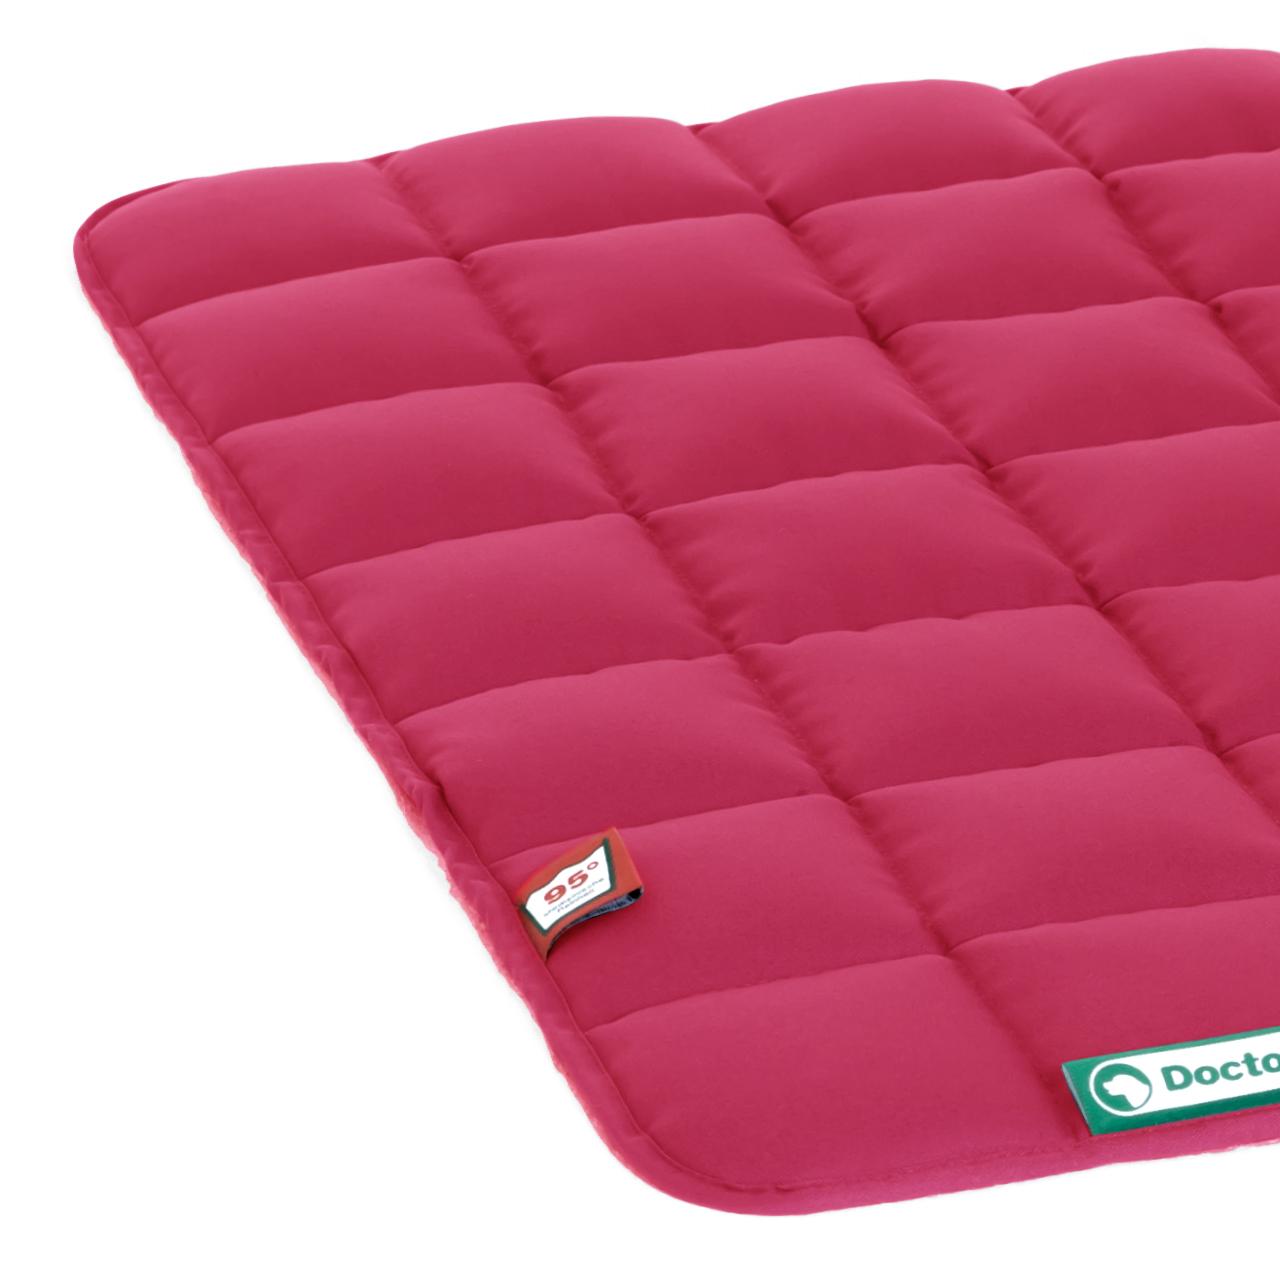 Steppdecke hot pink M